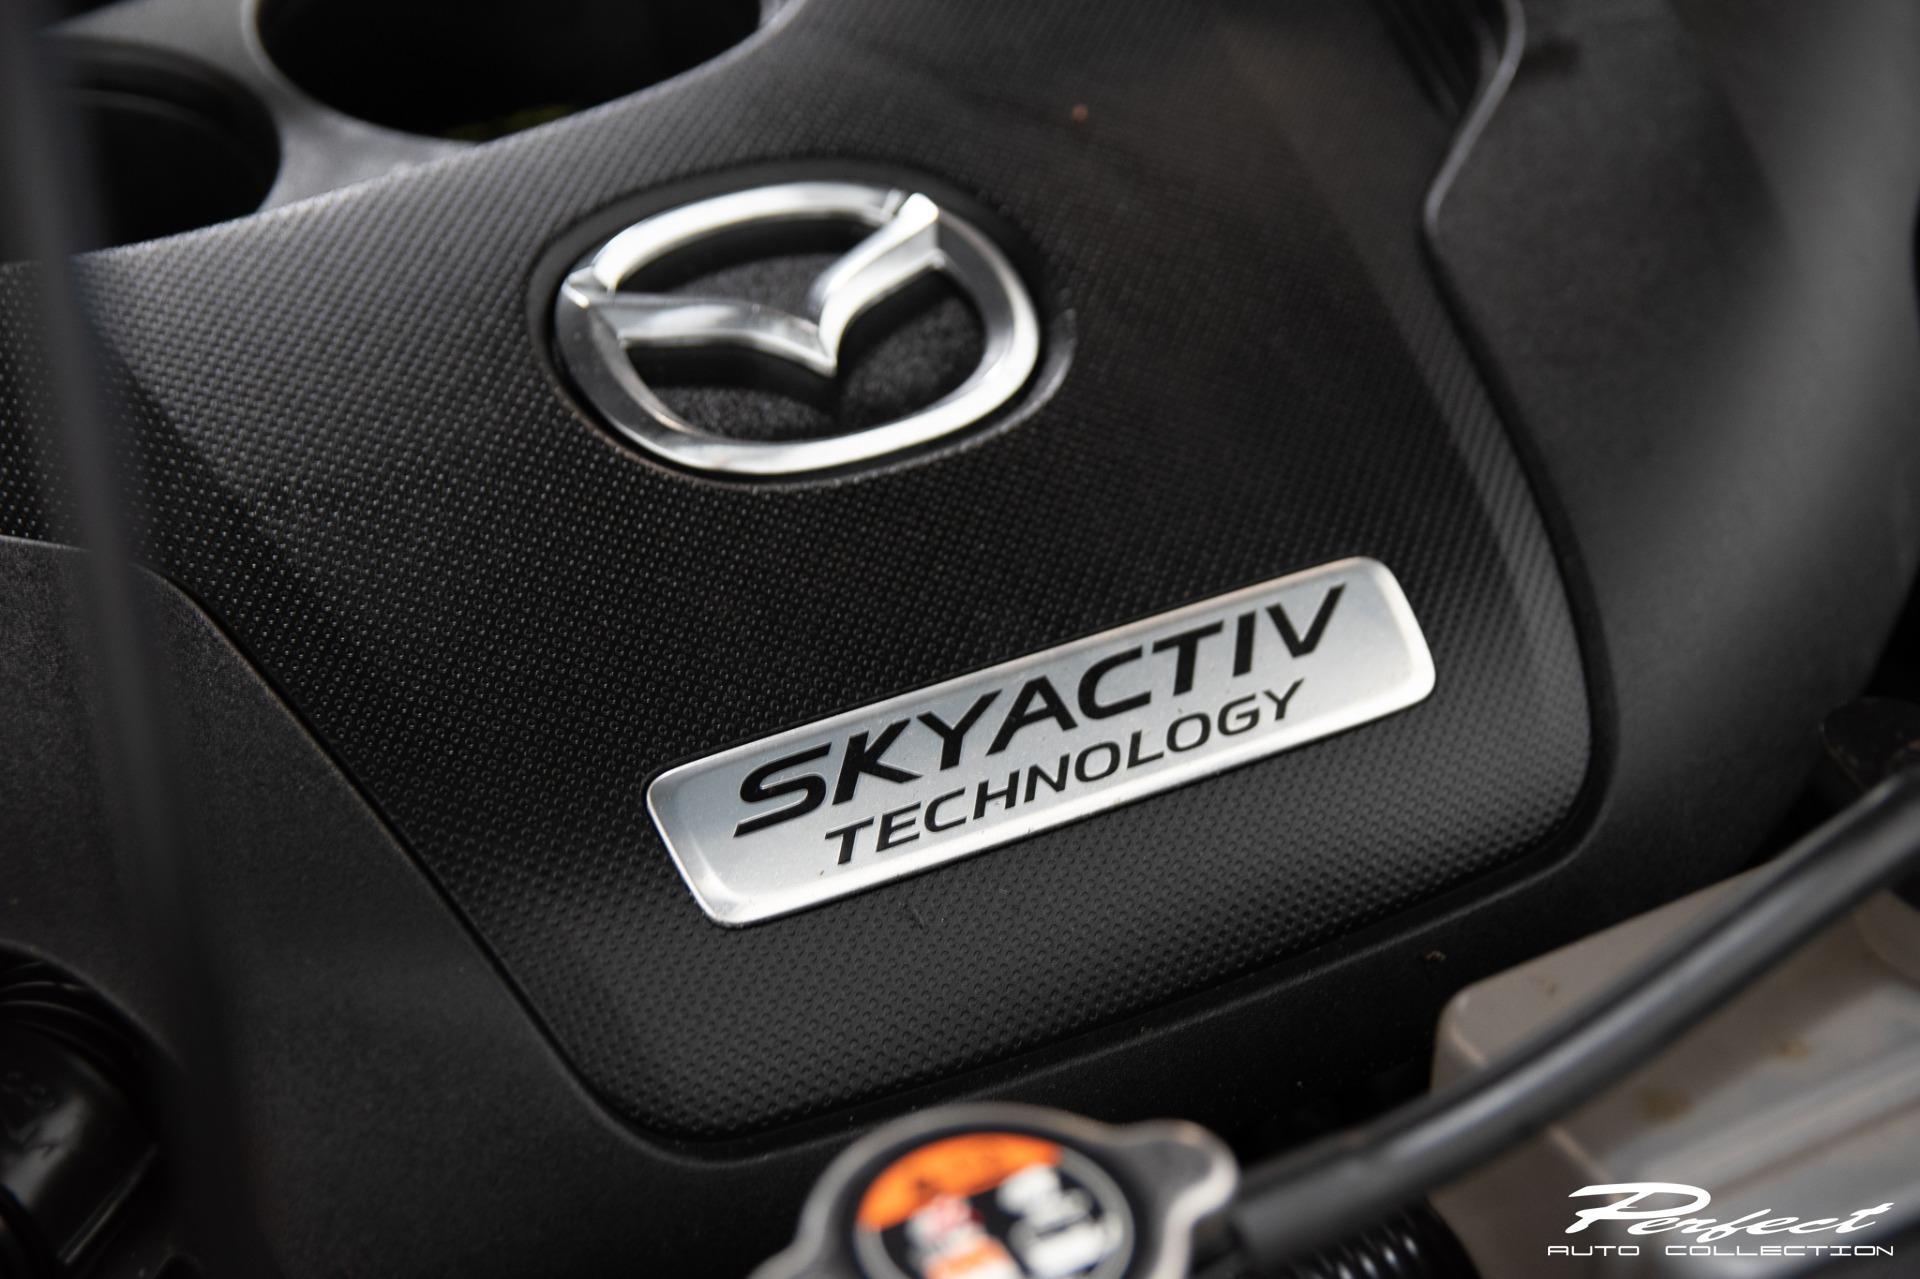 Used 2016 Mazda CX 9 Grand Touring